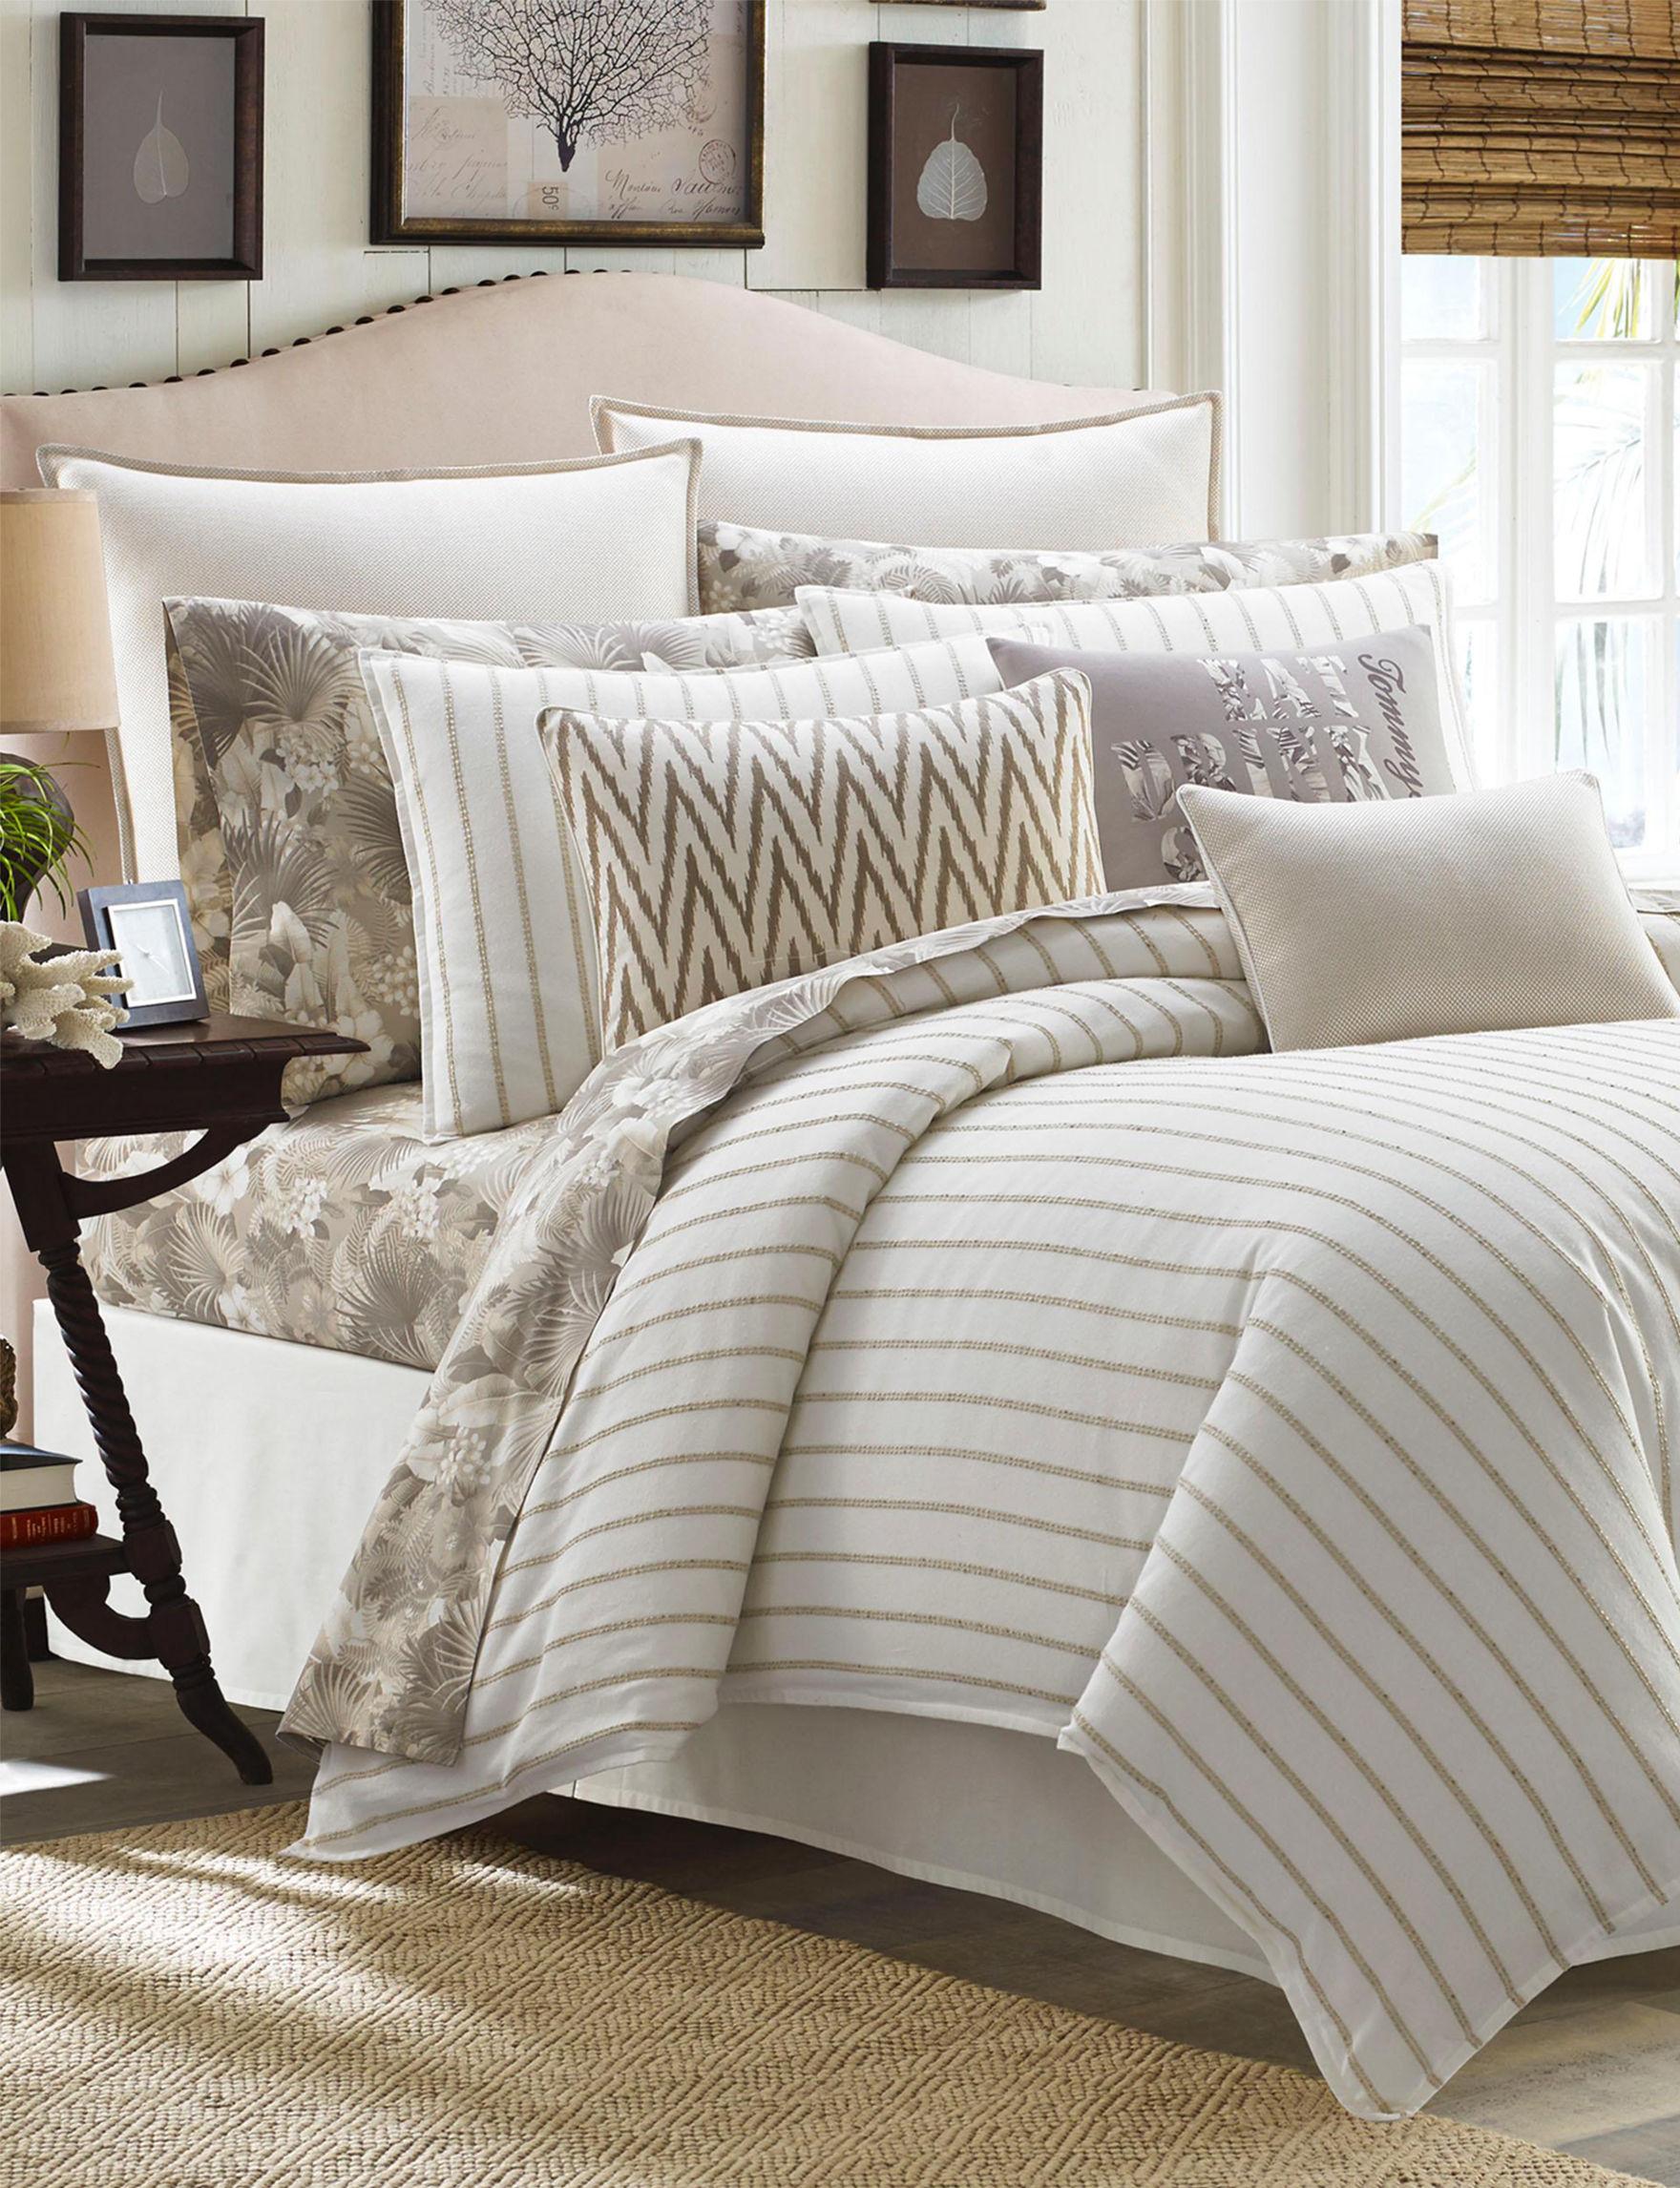 Tommy Bahama Beige Comforters & Comforter Sets